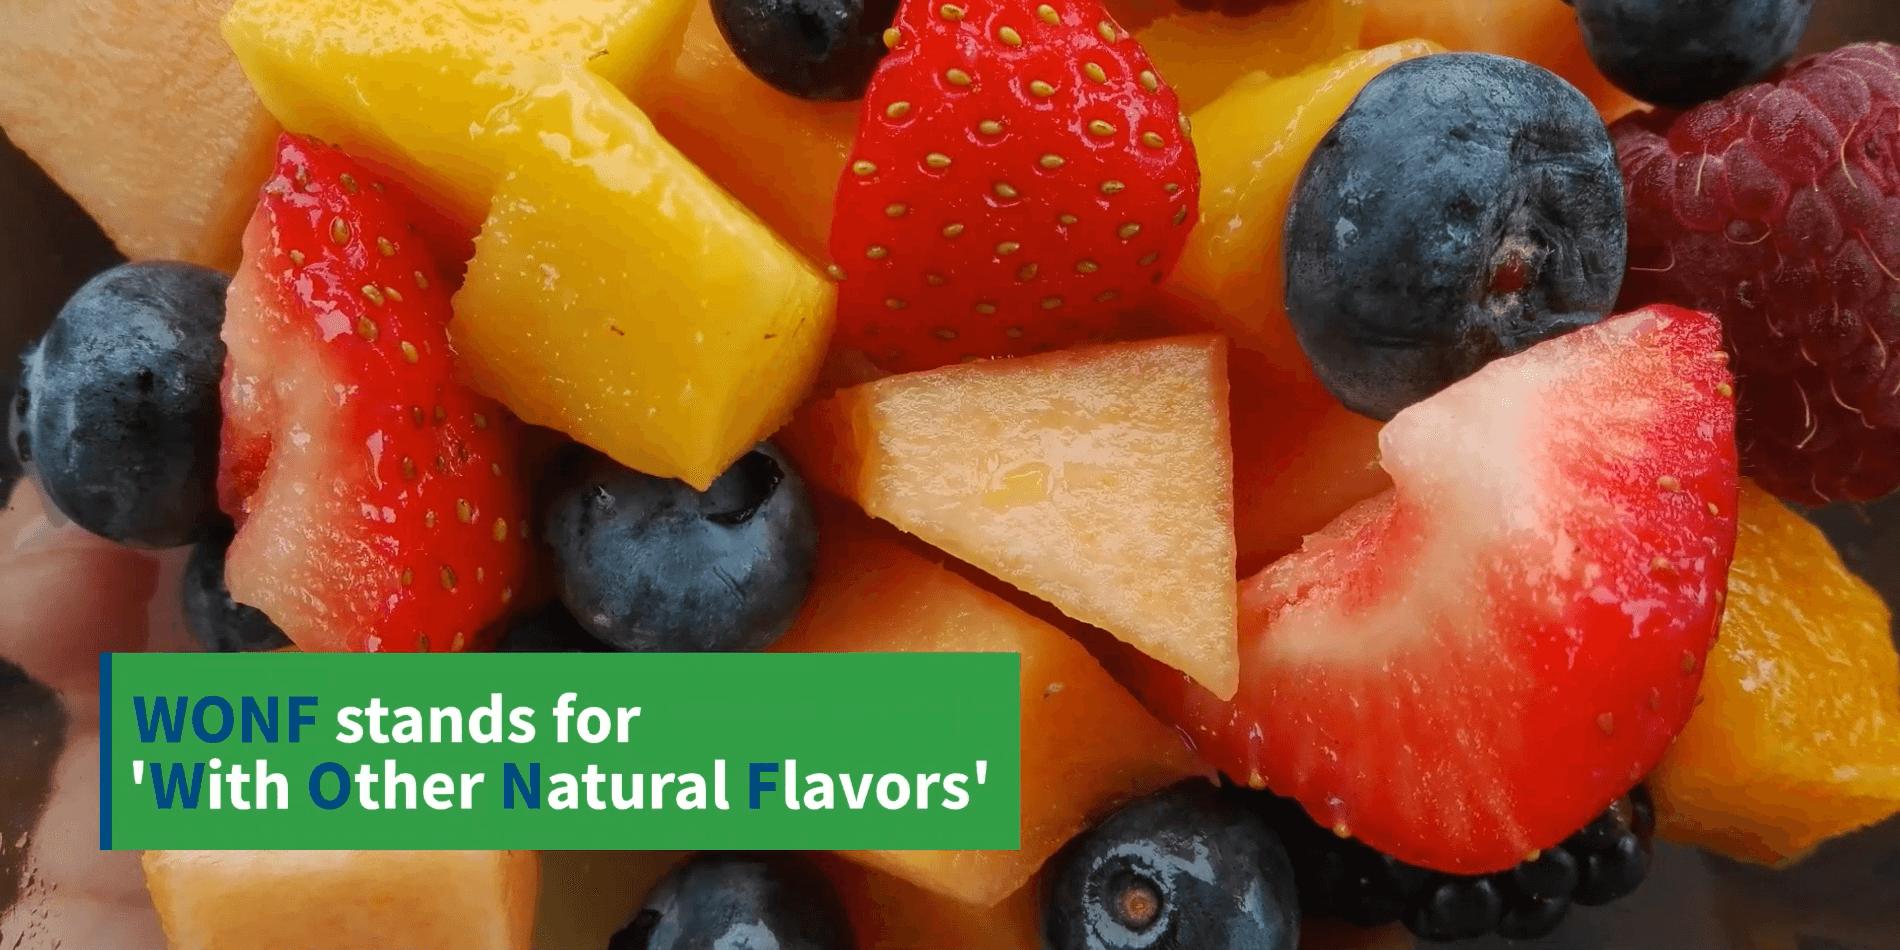 Natural WONF flavor